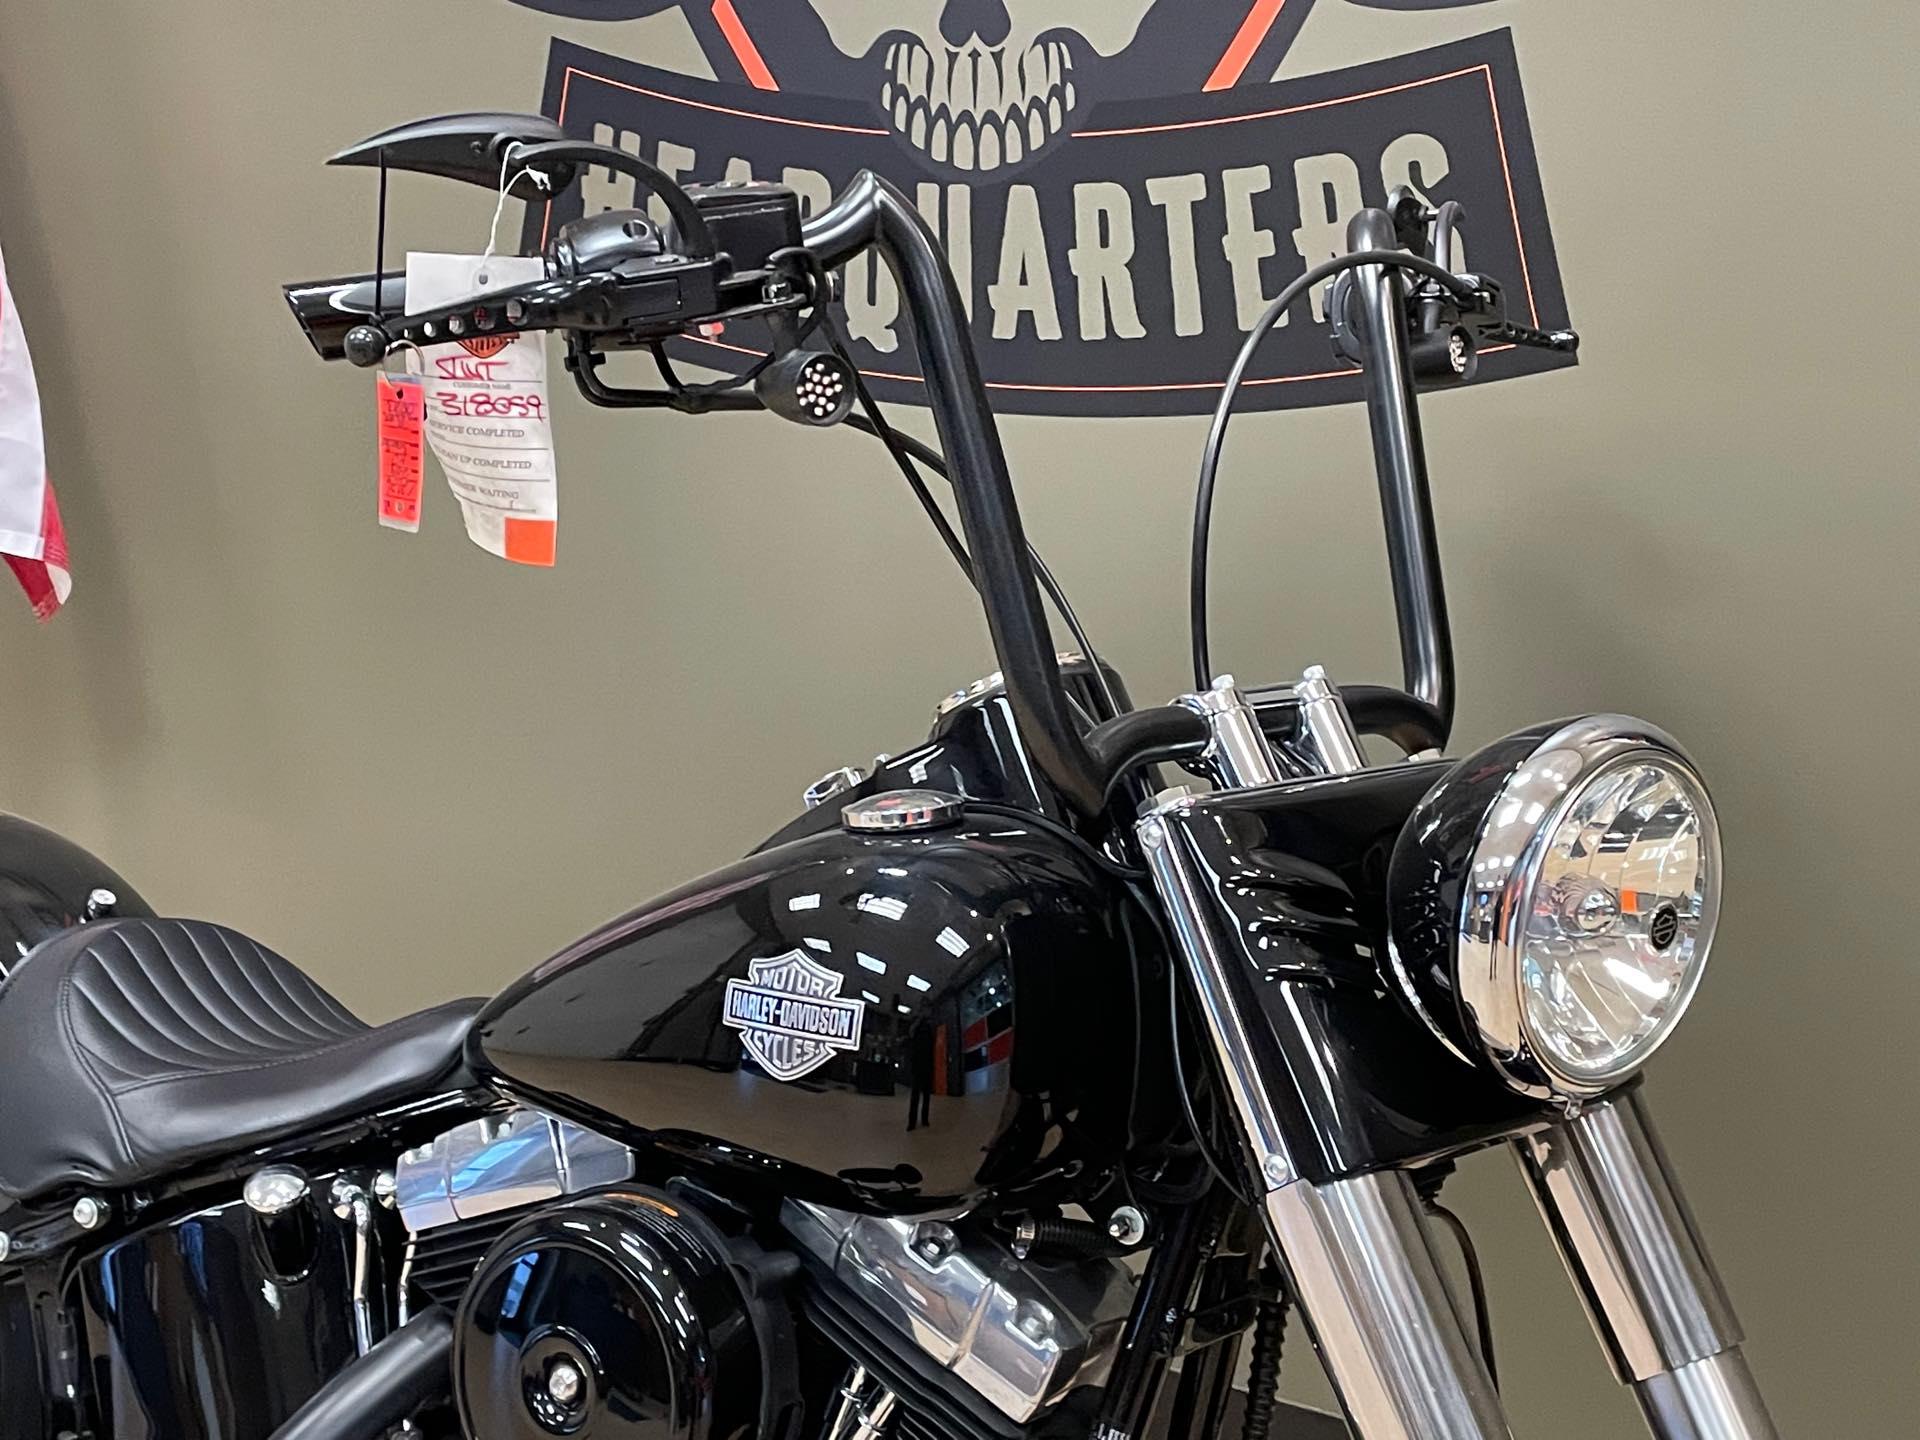 2014 Harley-Davidson Softail Slim at Loess Hills Harley-Davidson